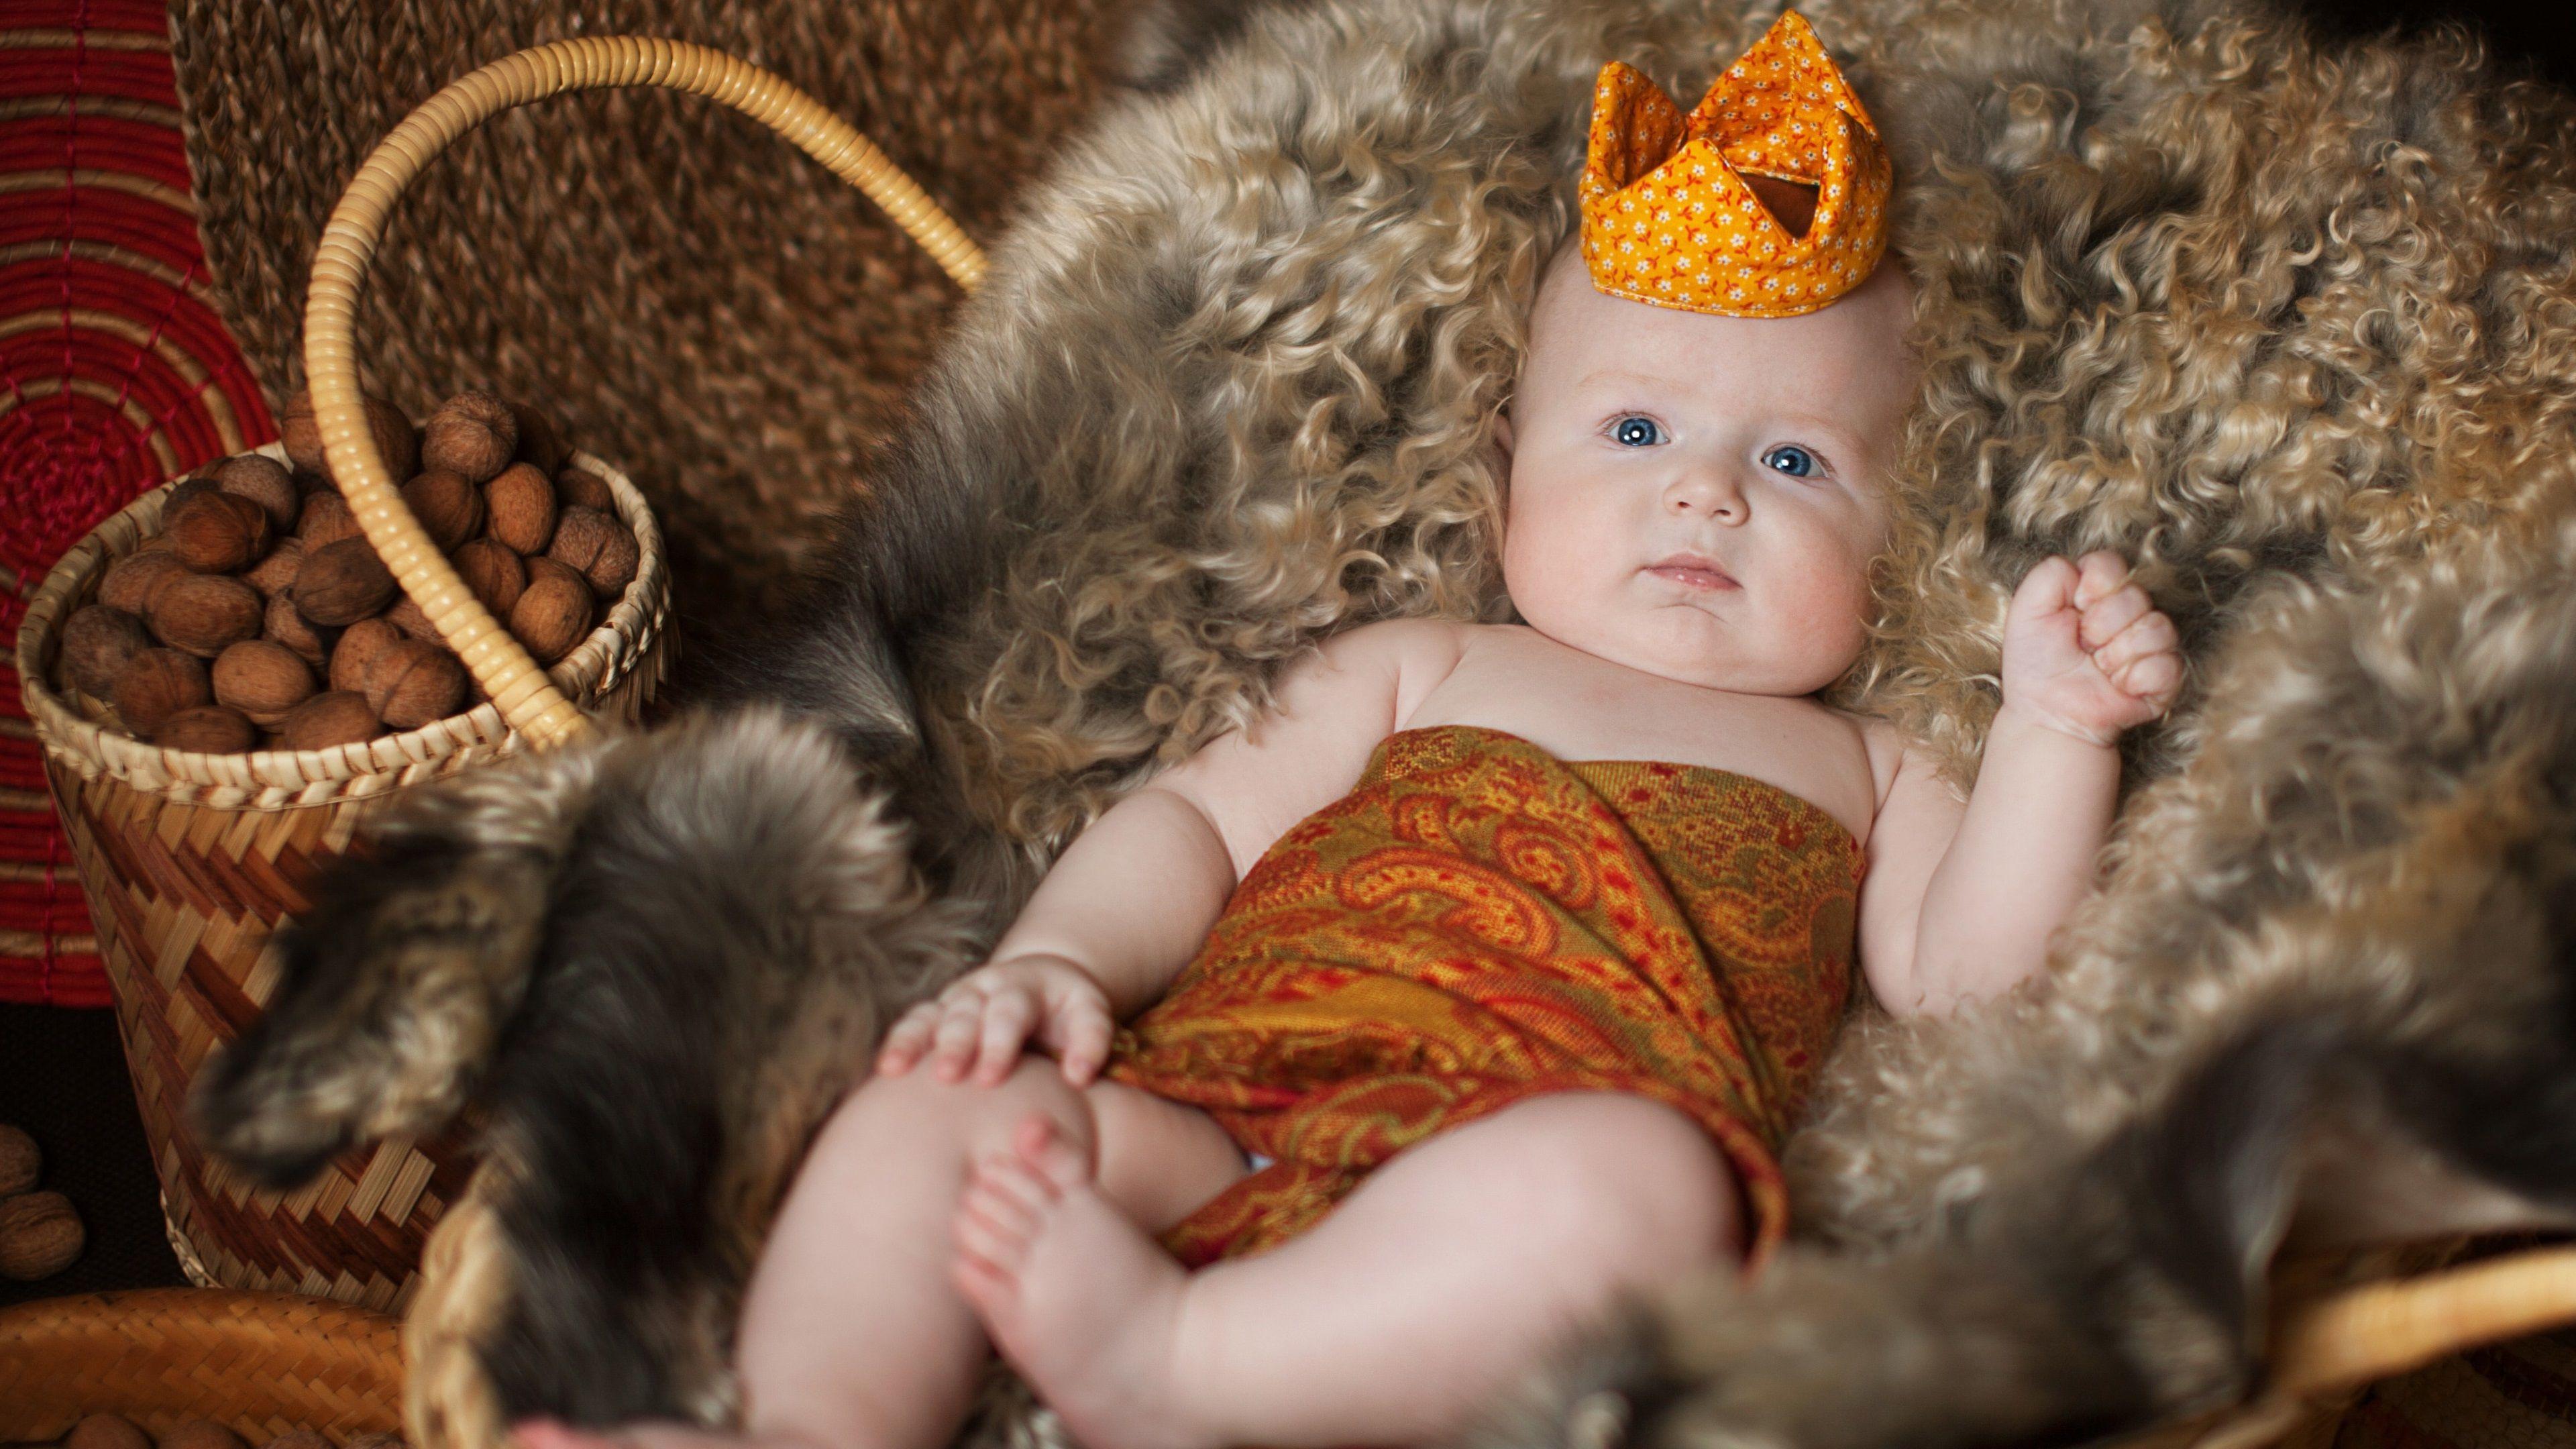 3840x2160 Cute Baby Boy 4k Hd Wallpaper For Free Download Baby Wallpaper Cute Baby Pictures Cute Baby Wallpaper